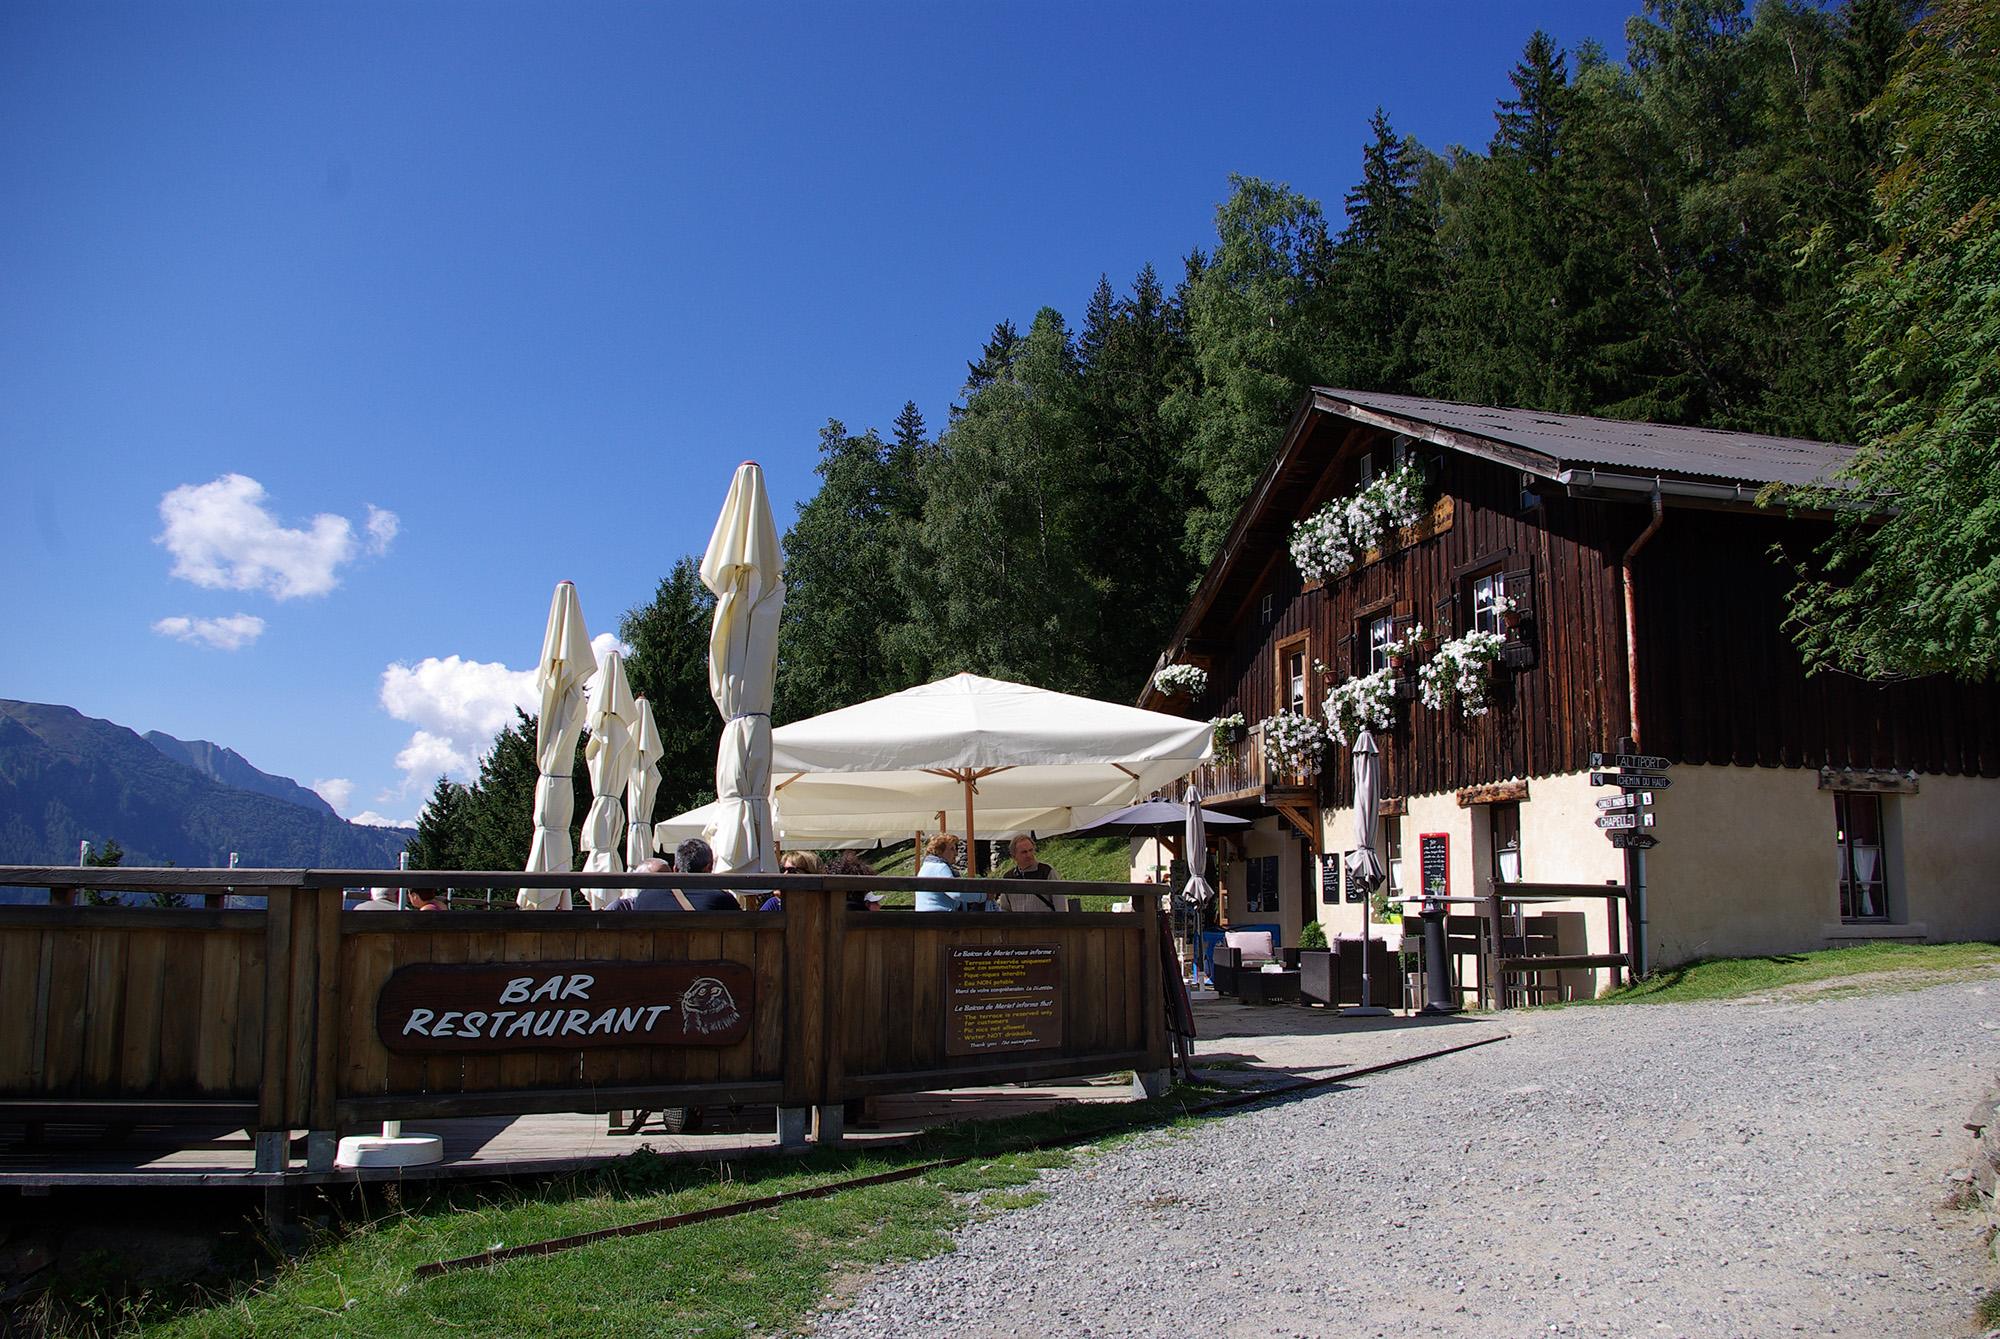 Terrace - The Balcon de Merlet restaurant